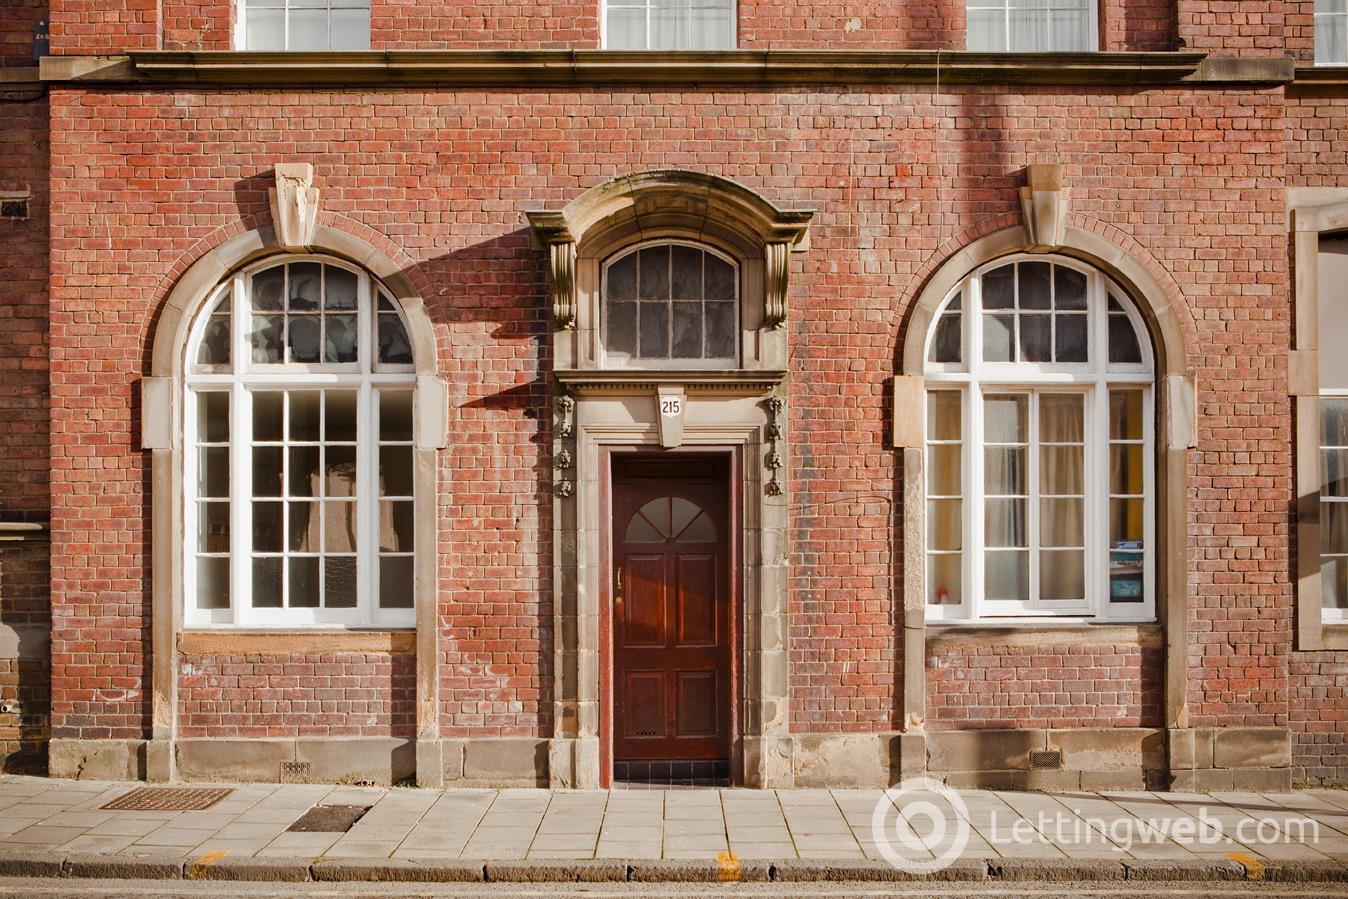 Property to rent in Causewayside, Edinburgh - Lettingweb